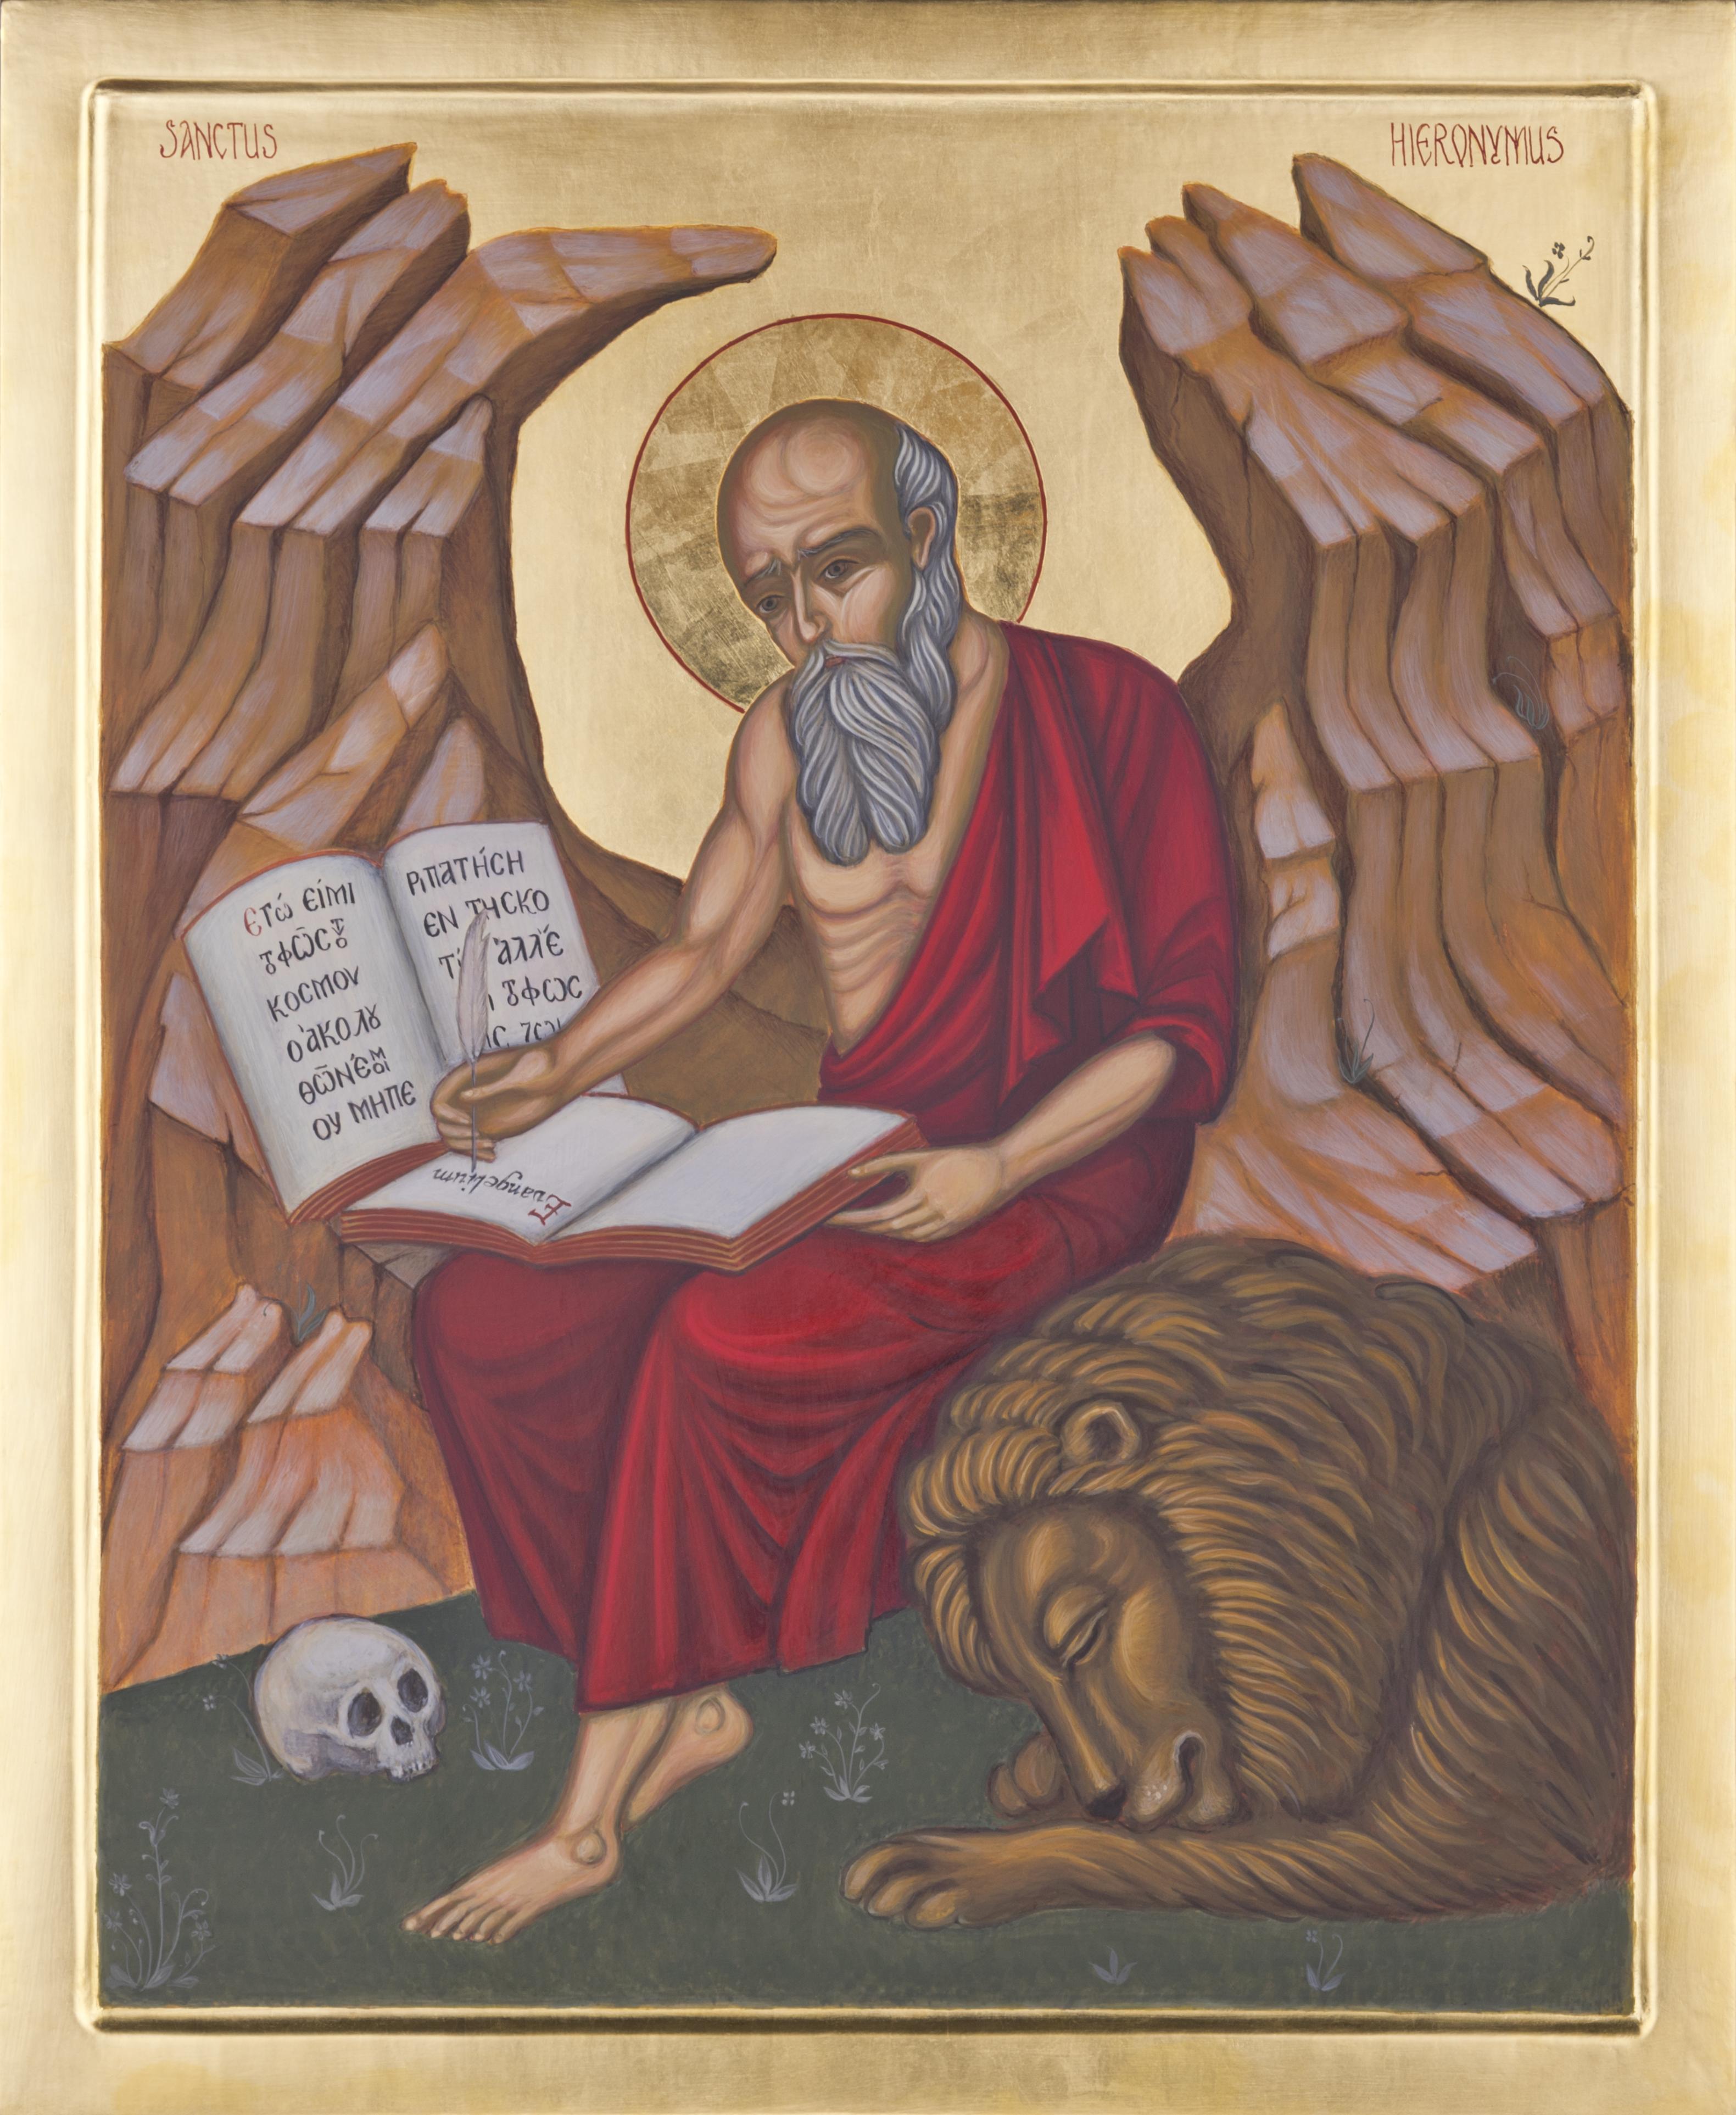 Ikona św. Hieronima